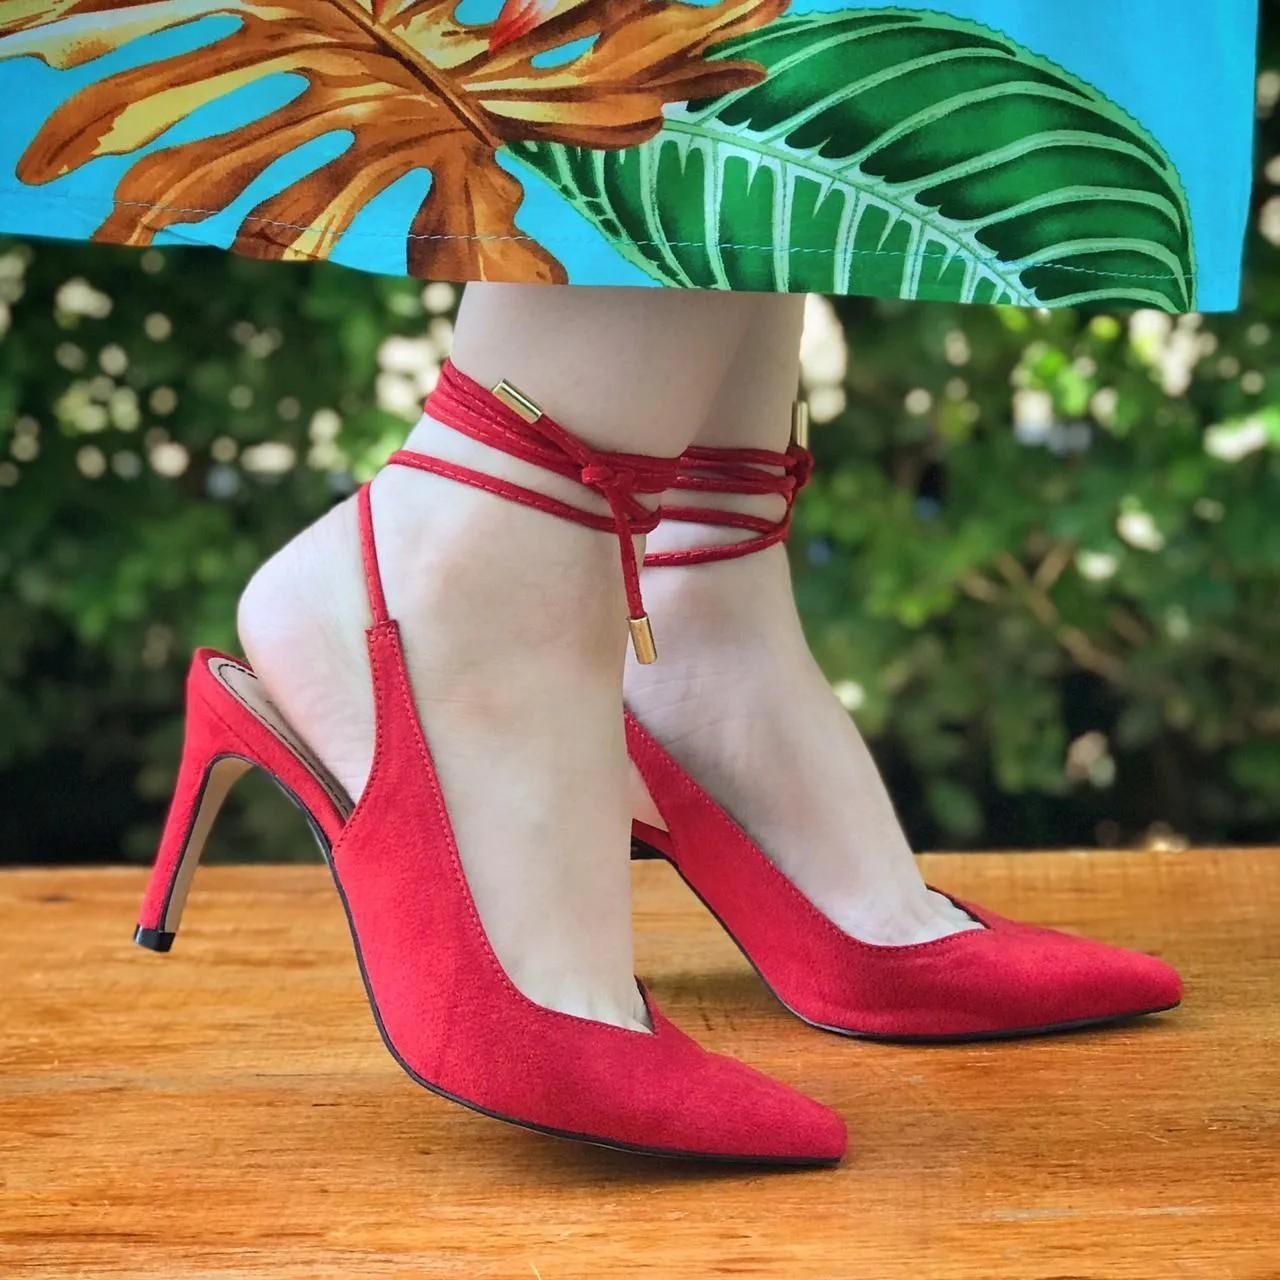 Chanel Maya Vermelho by Deborah Munhoz